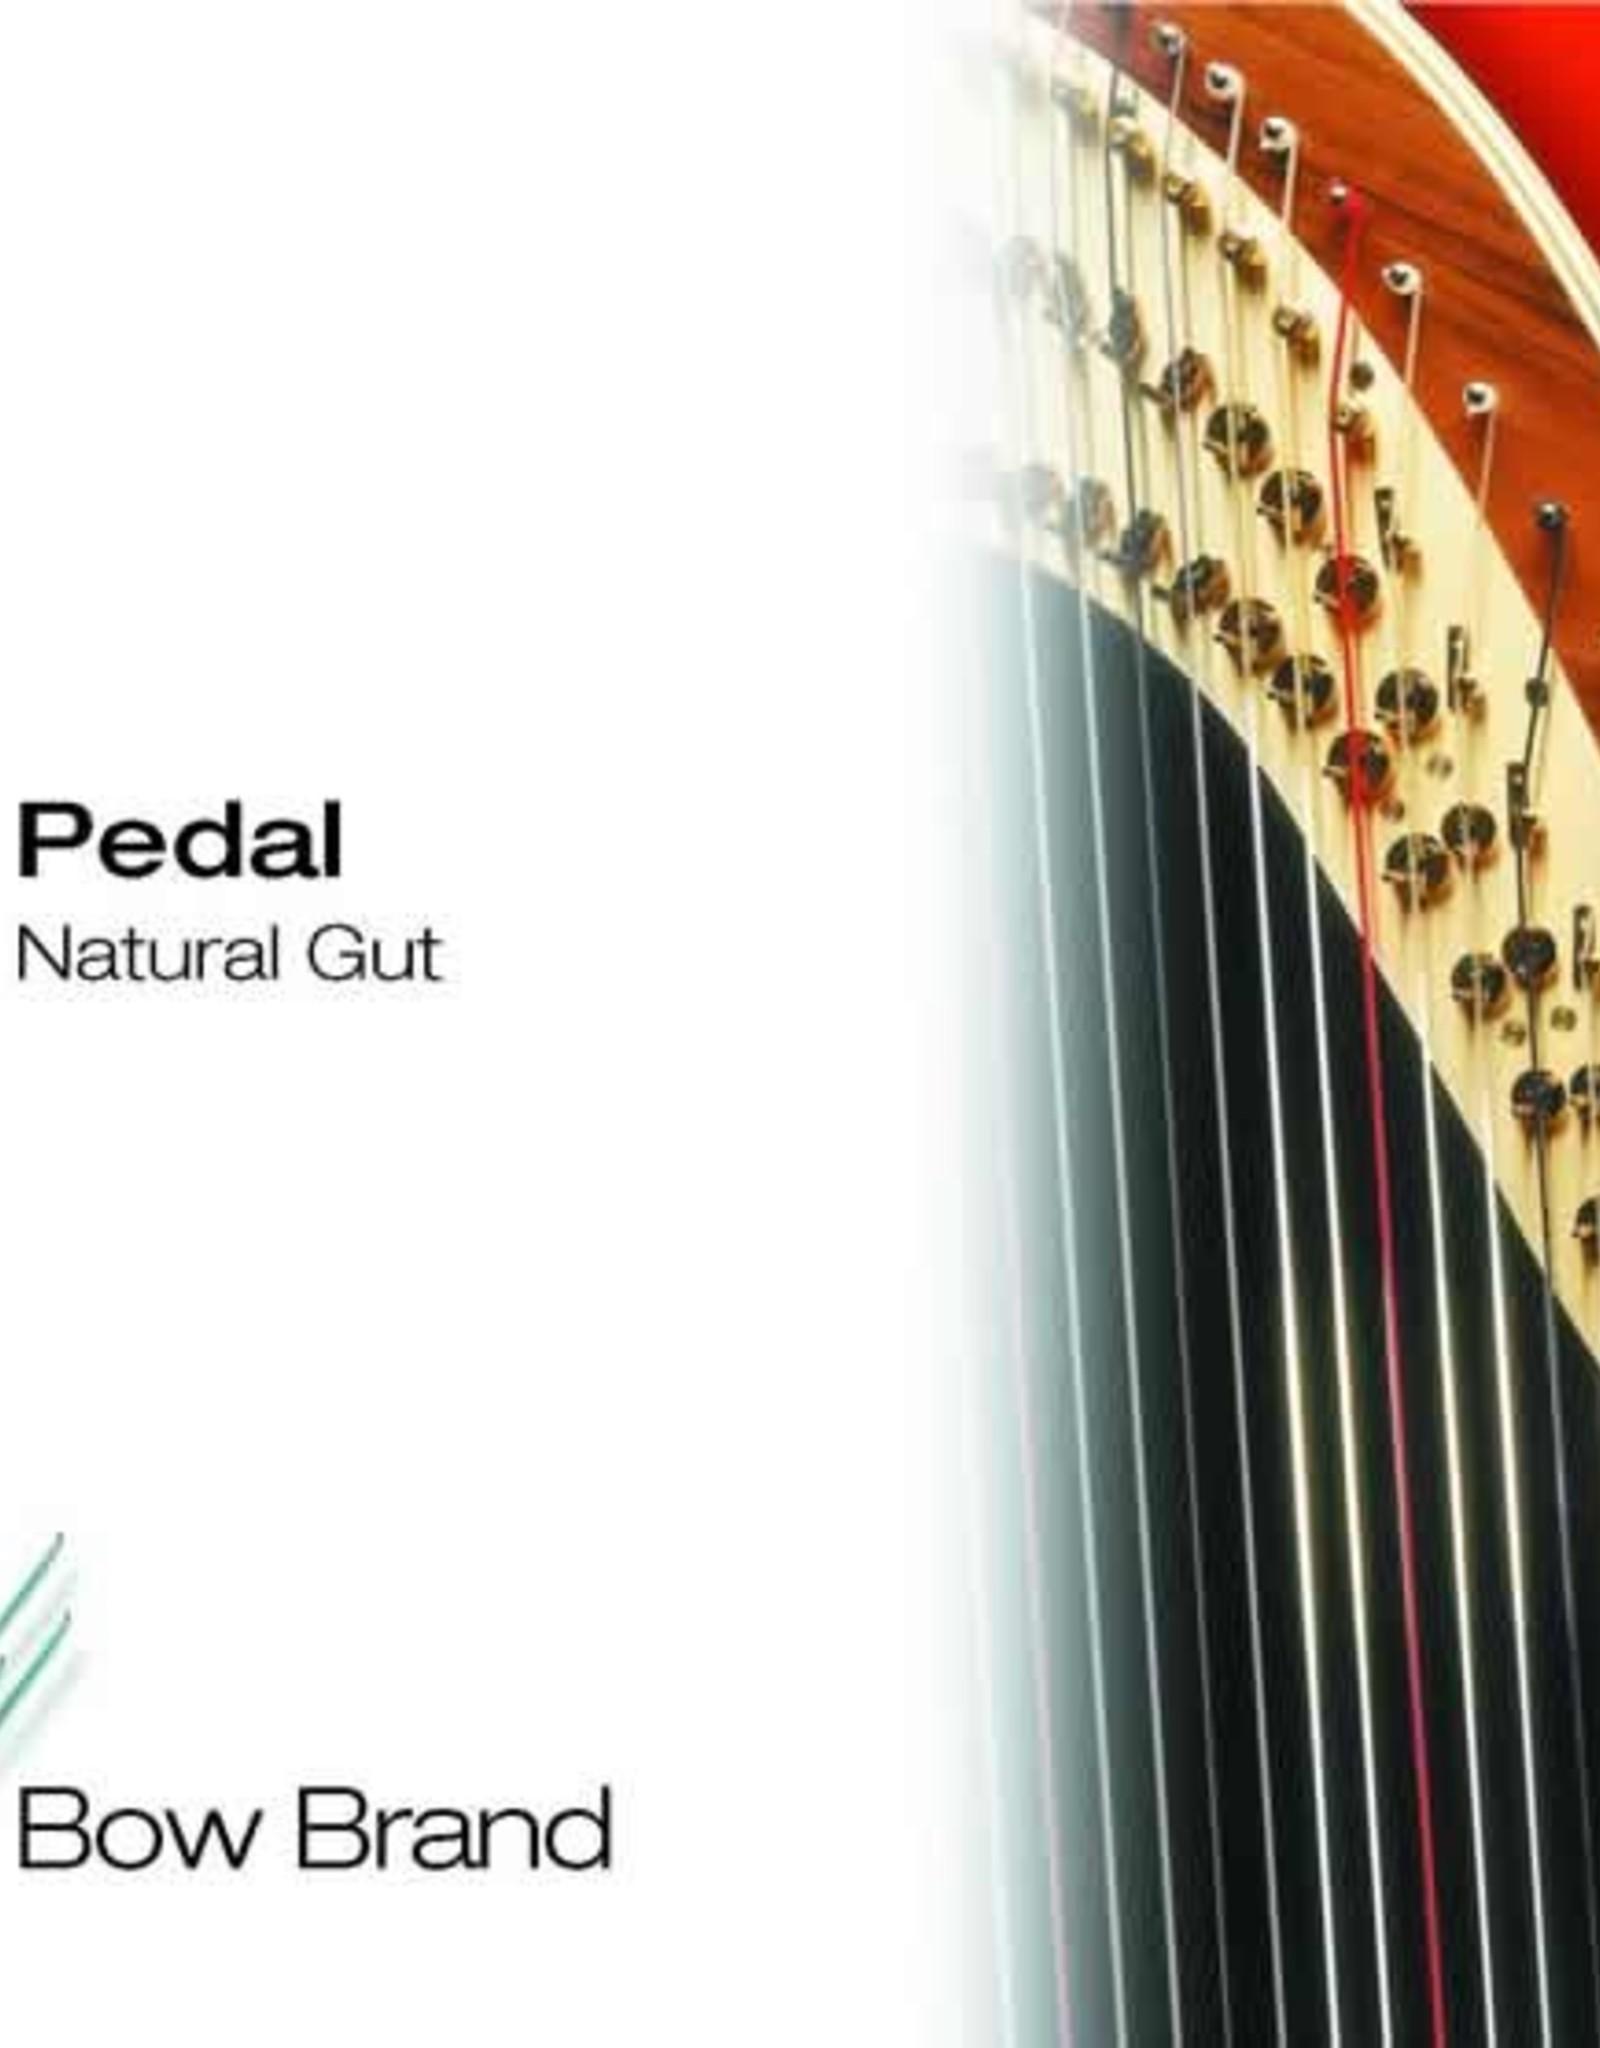 BOW BRAND  pedaal darm - pedal STD GUT 27/4 sol